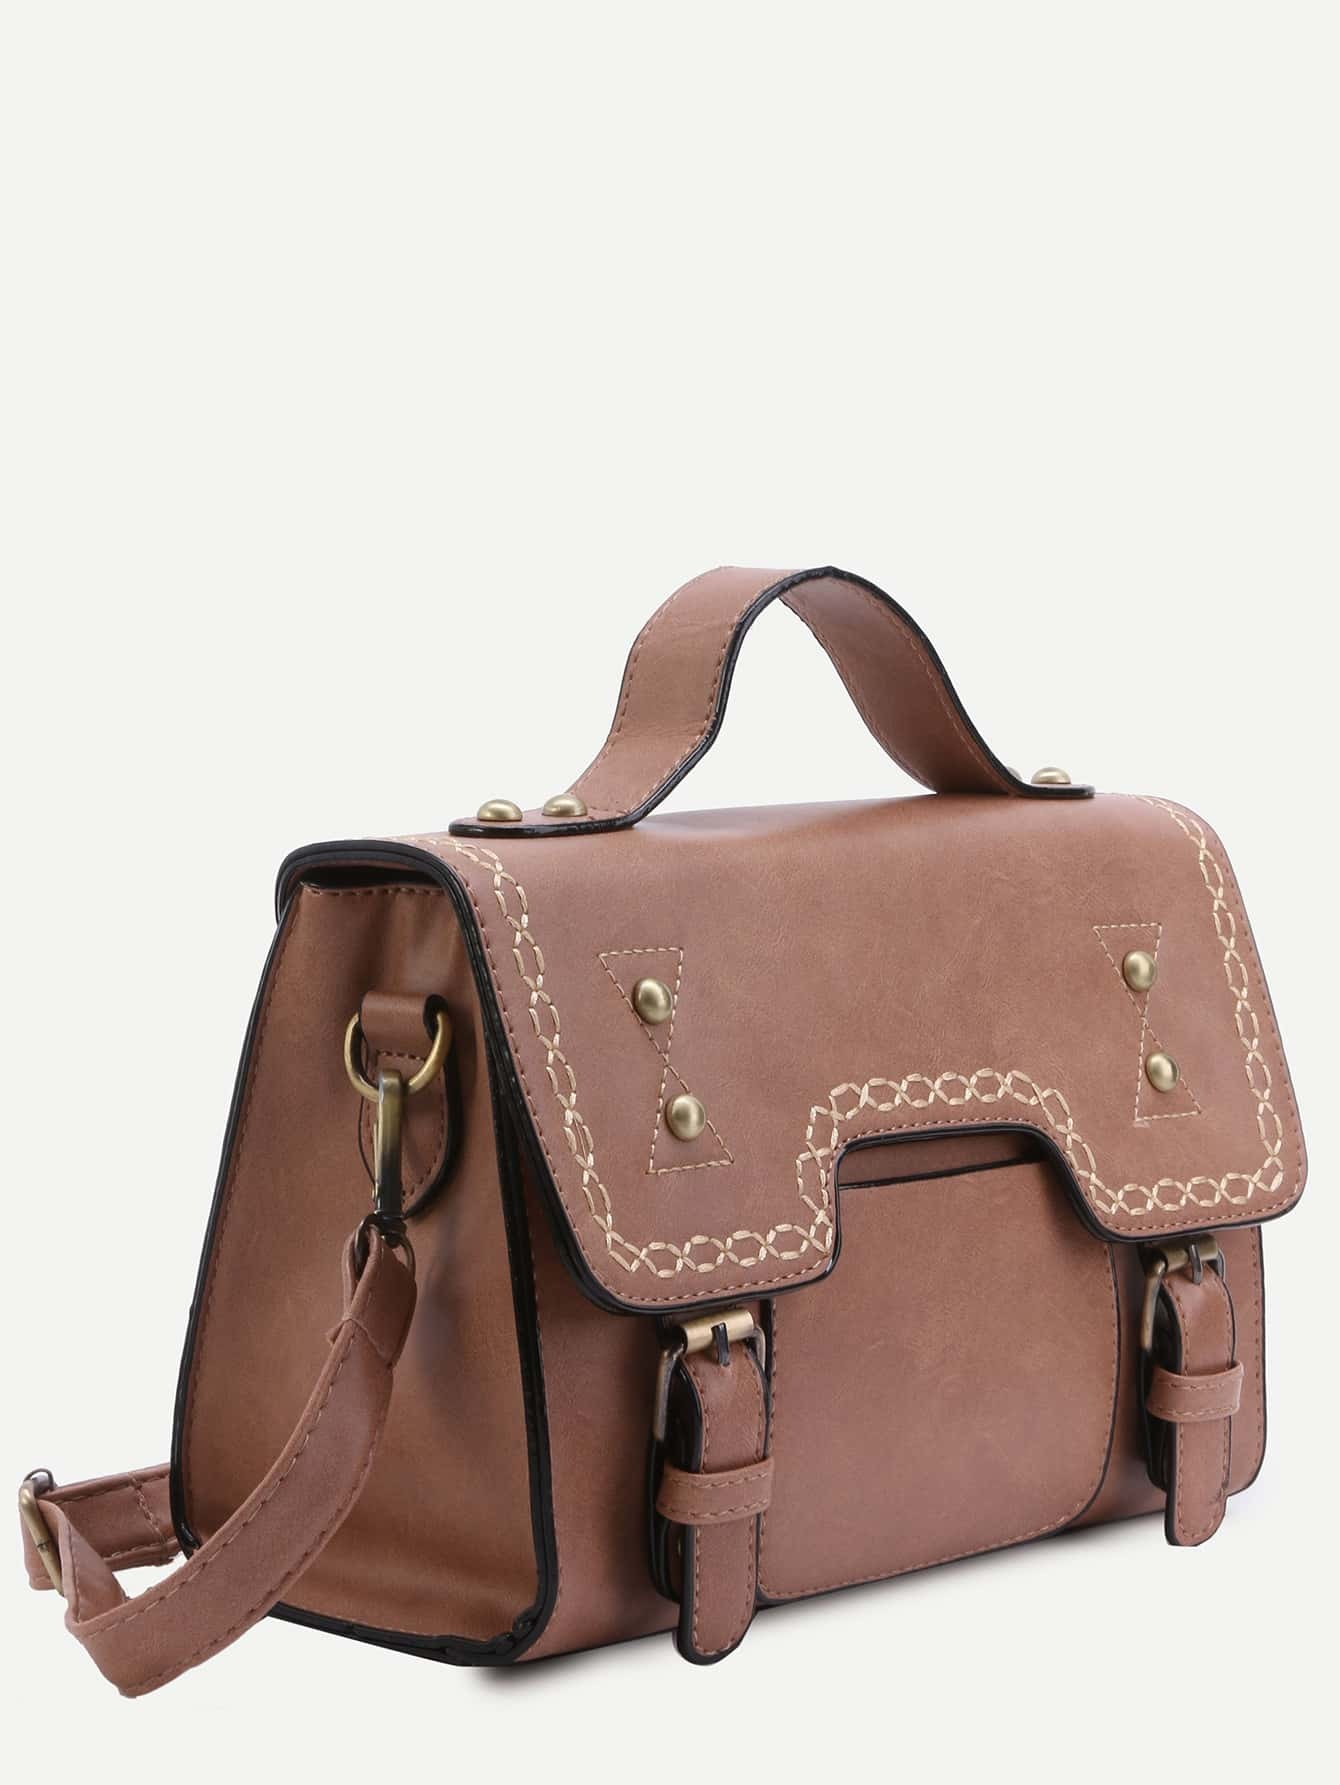 bag160928005_2